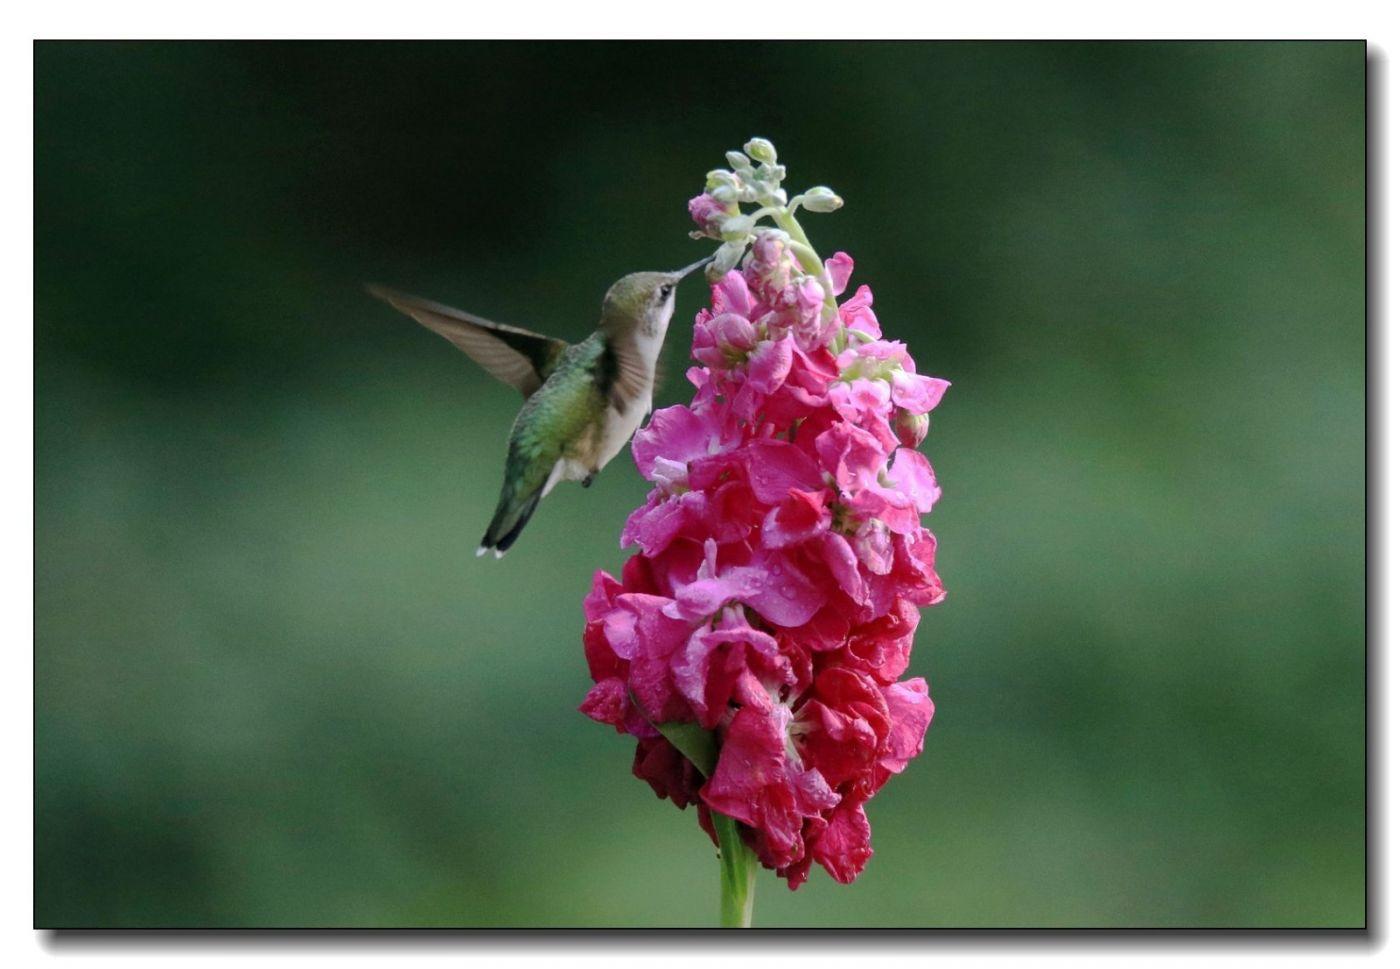 蜂鸟组图(一)_图1-1